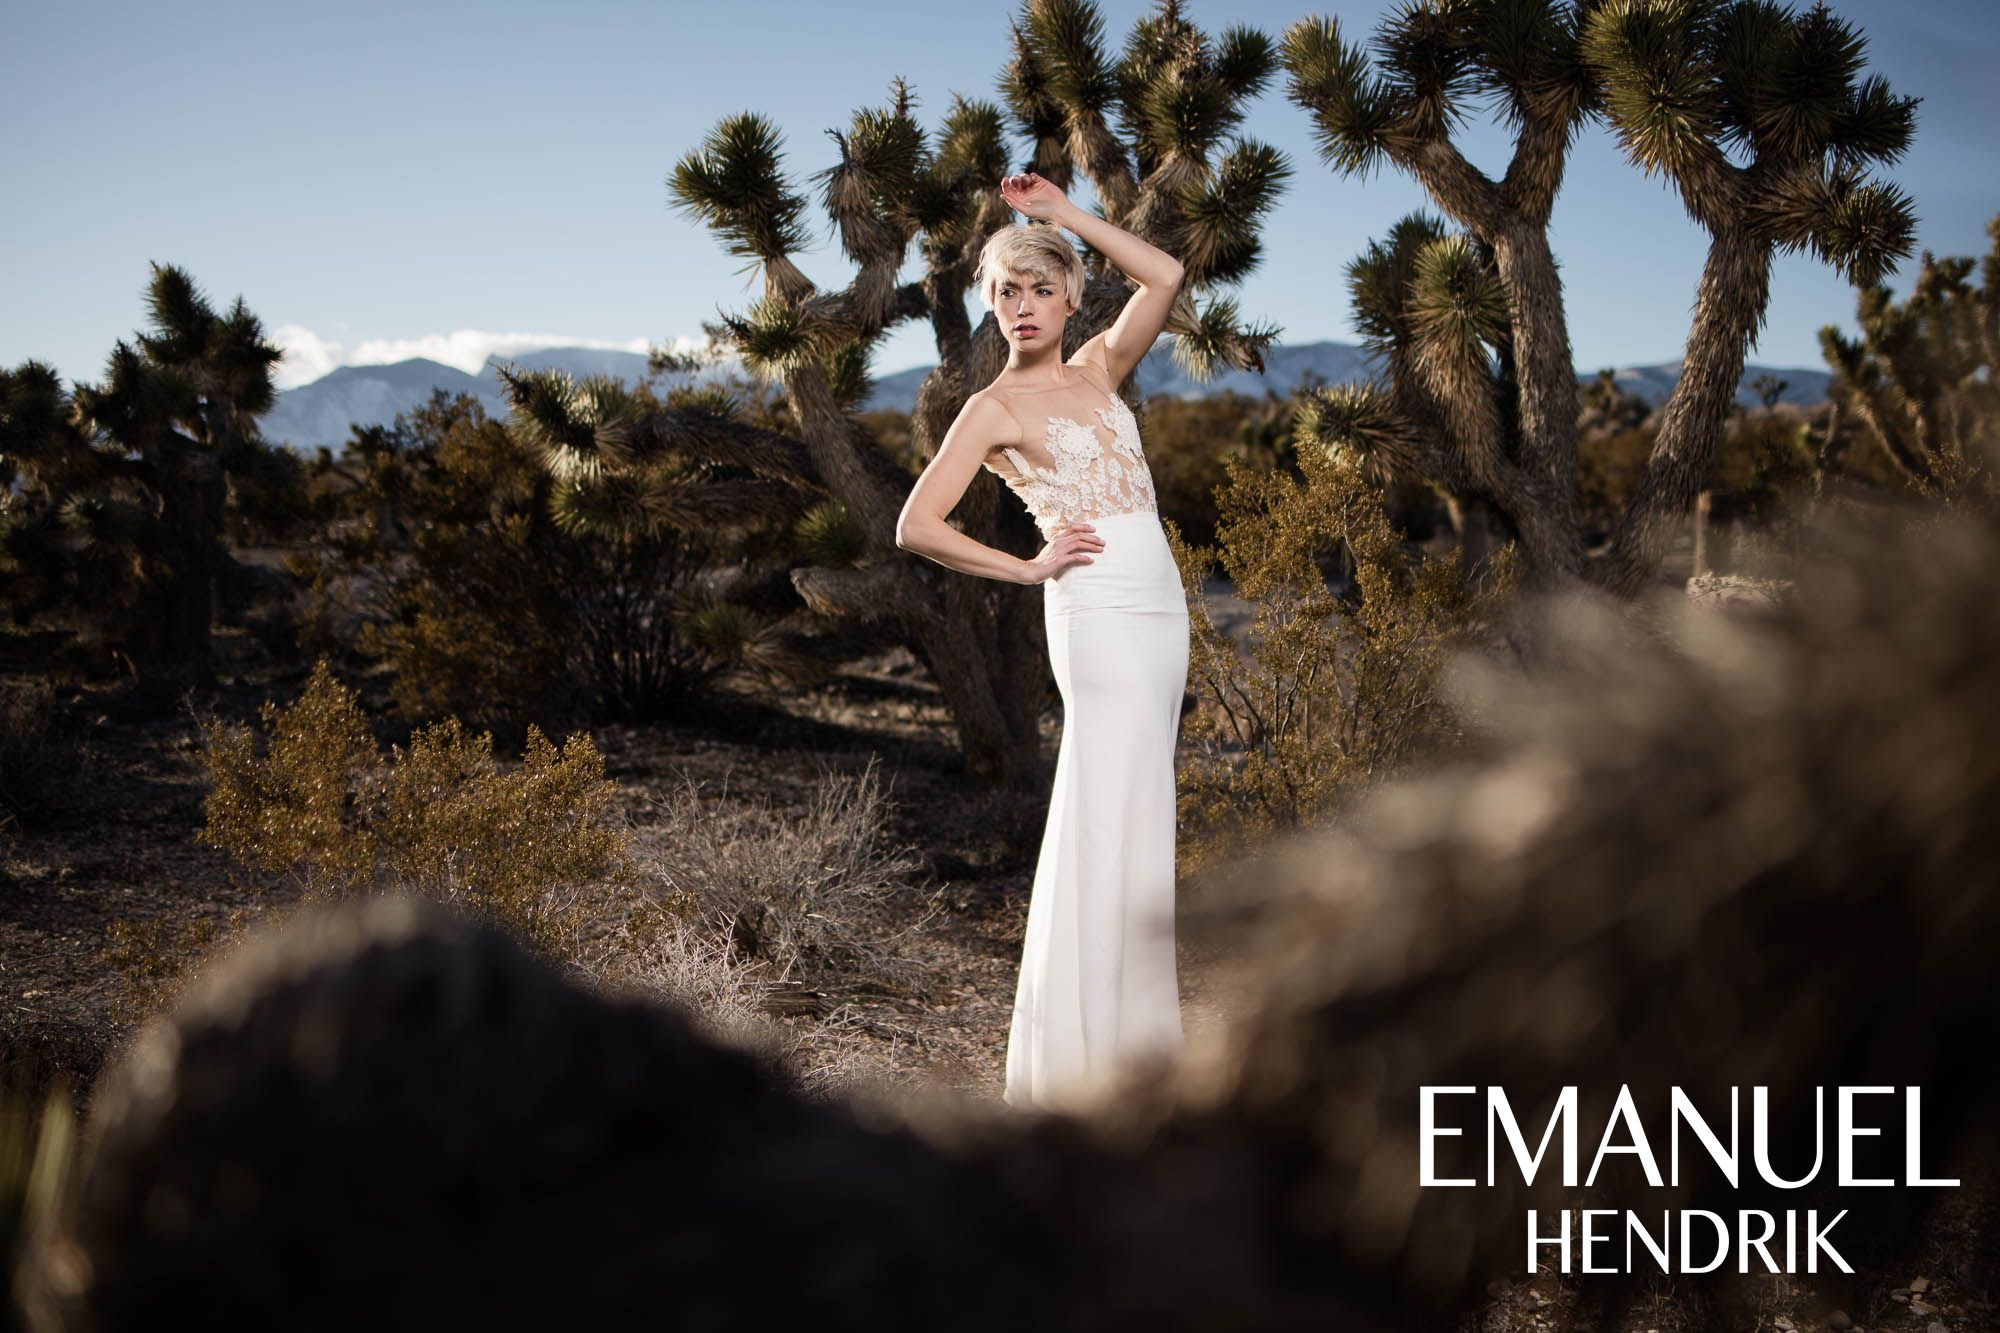 EMANUEL HENDRIK | Body: Hotness | Rock: Mila | Brautkleid - Wedding ...